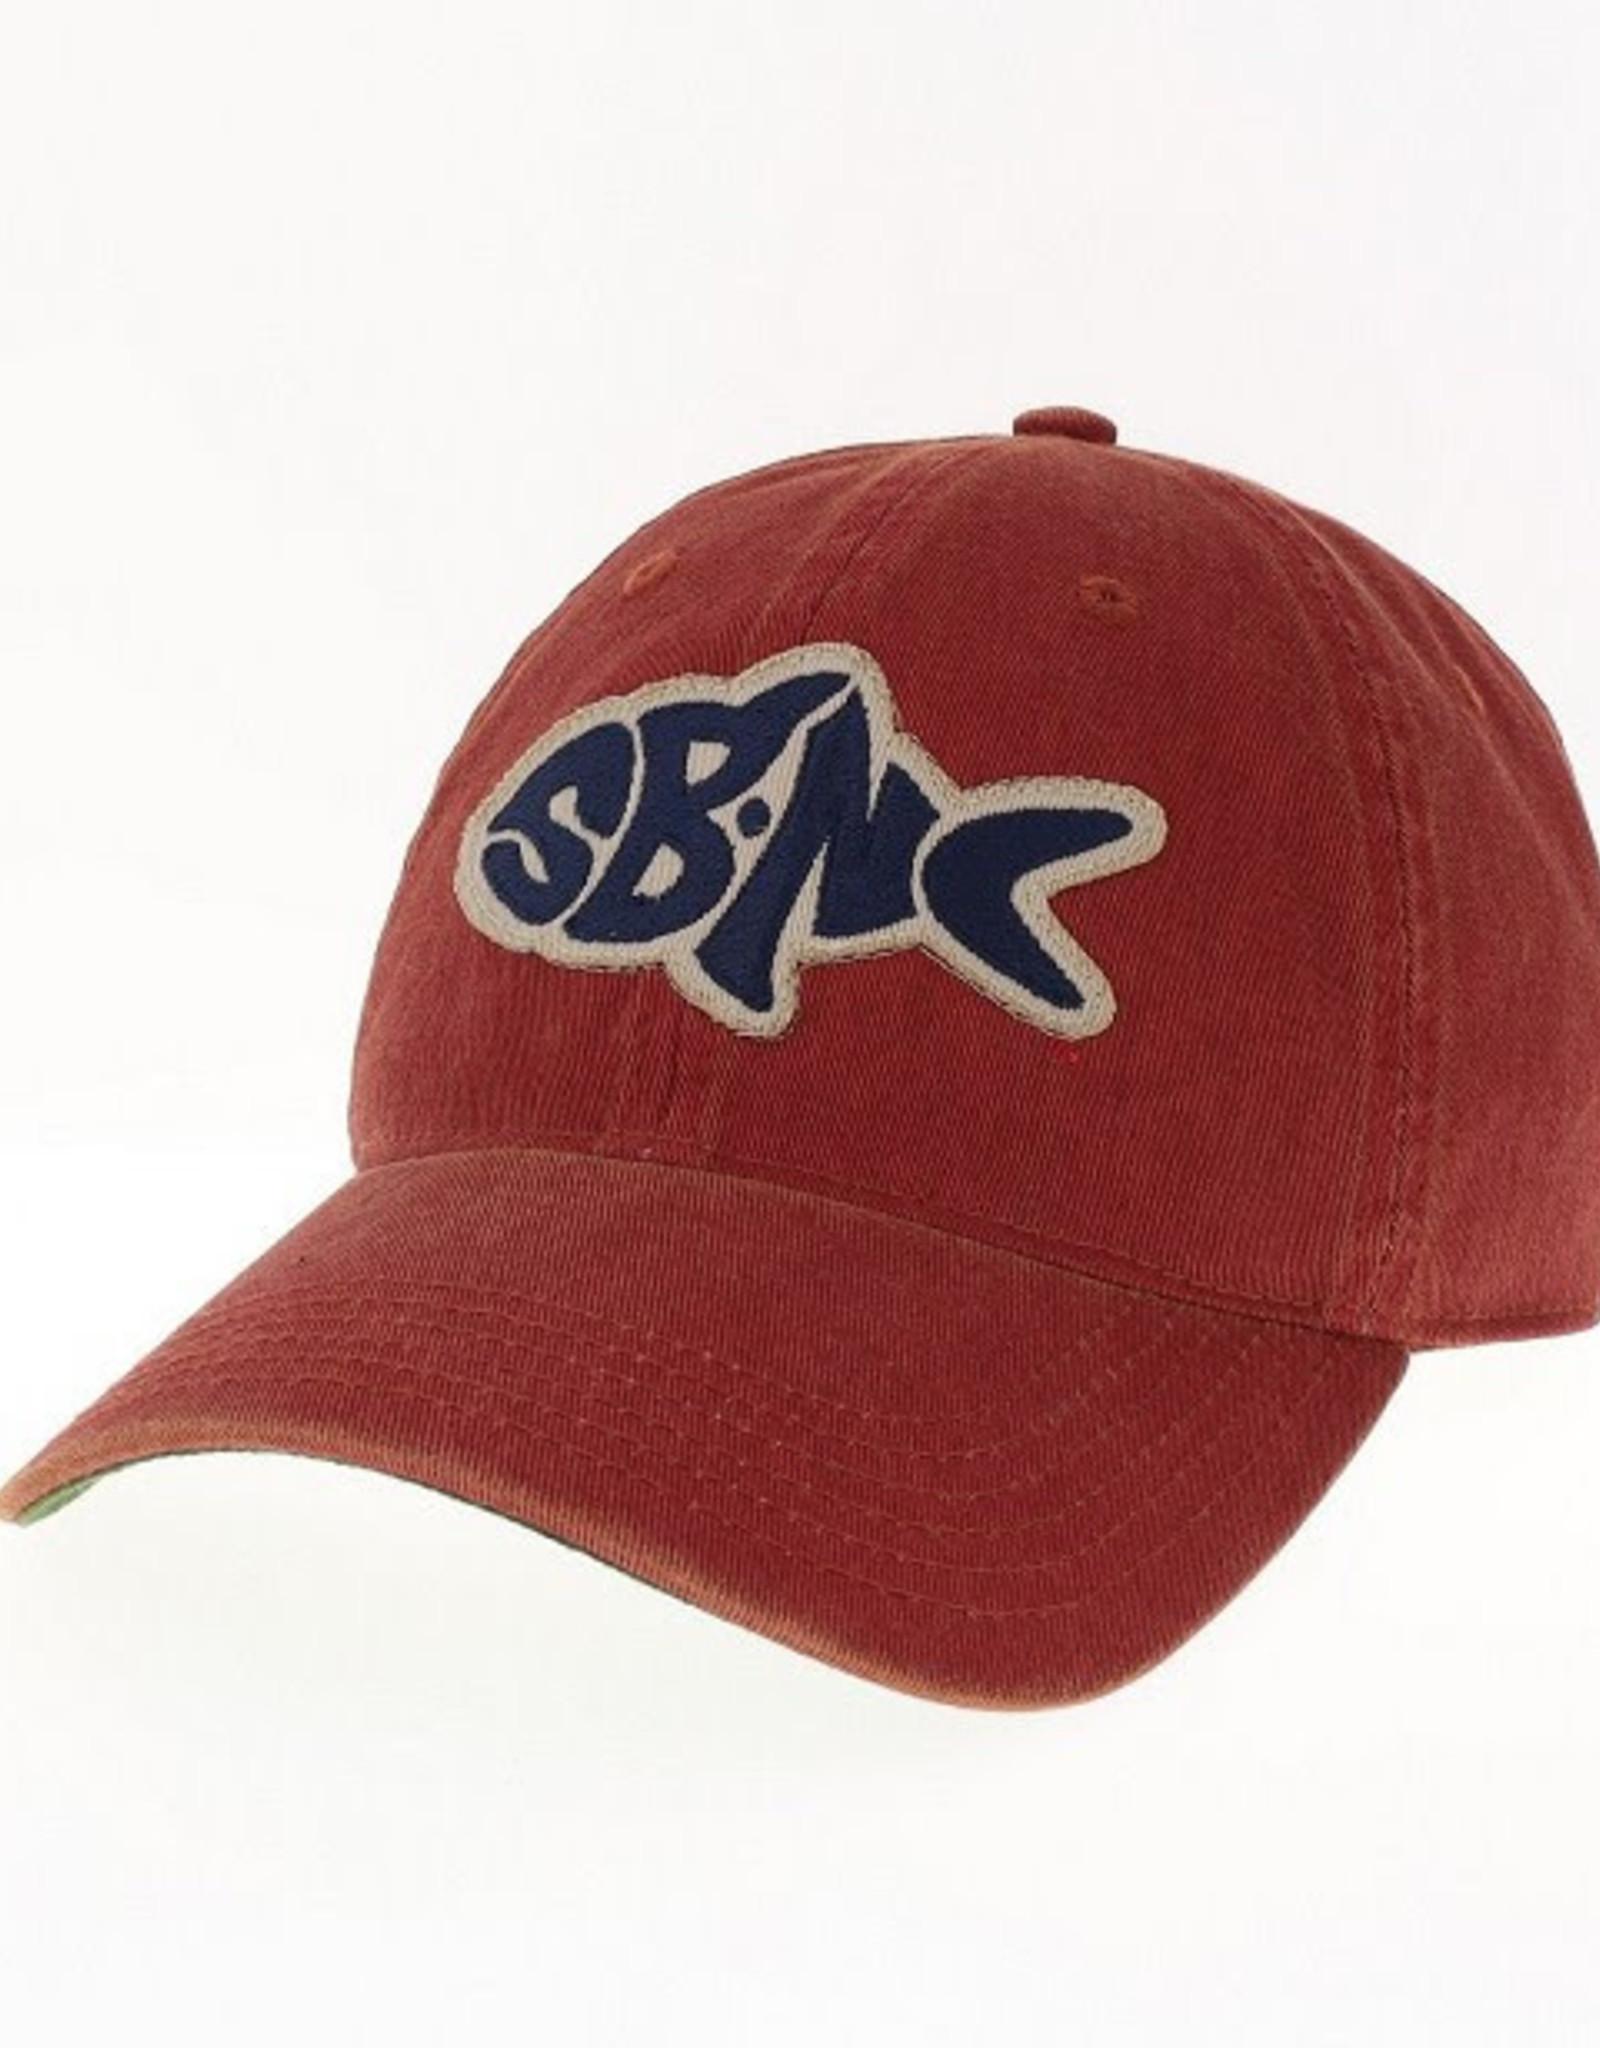 sbncfish SBNC FISH OFA FULL TWILL CAP CARDINAL